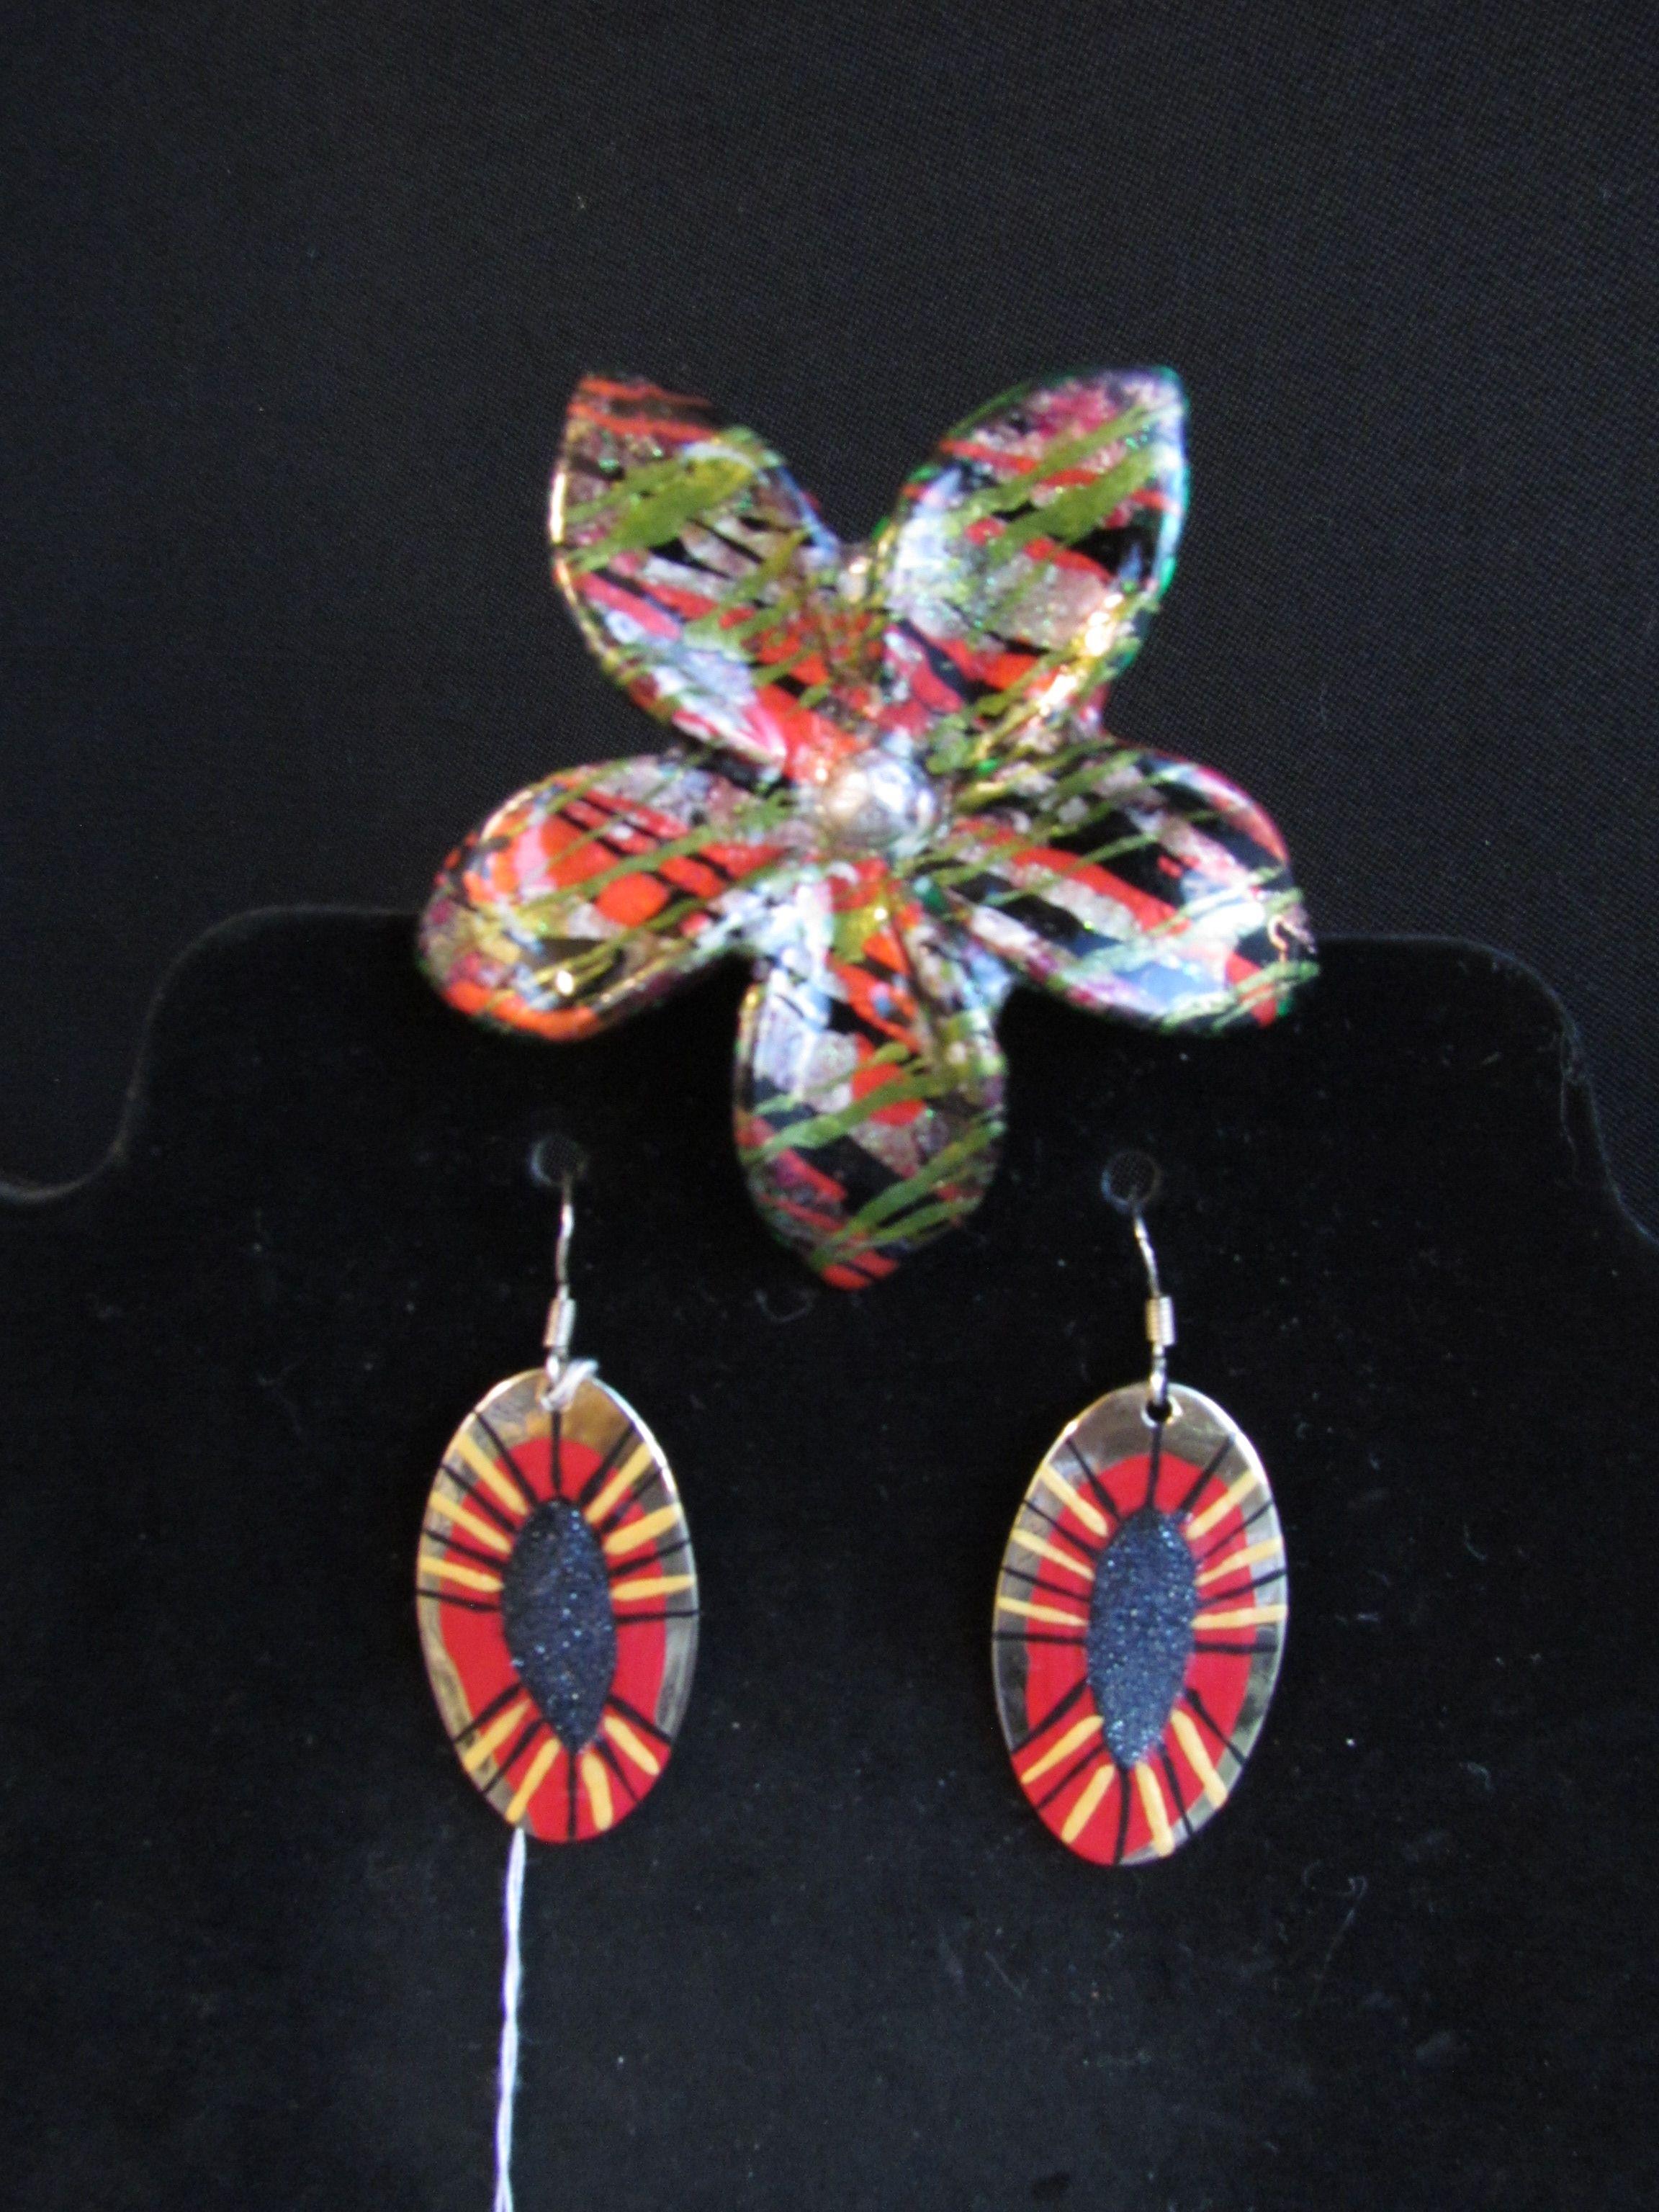 #119 Earrings and Clip $60 - Kikih Care